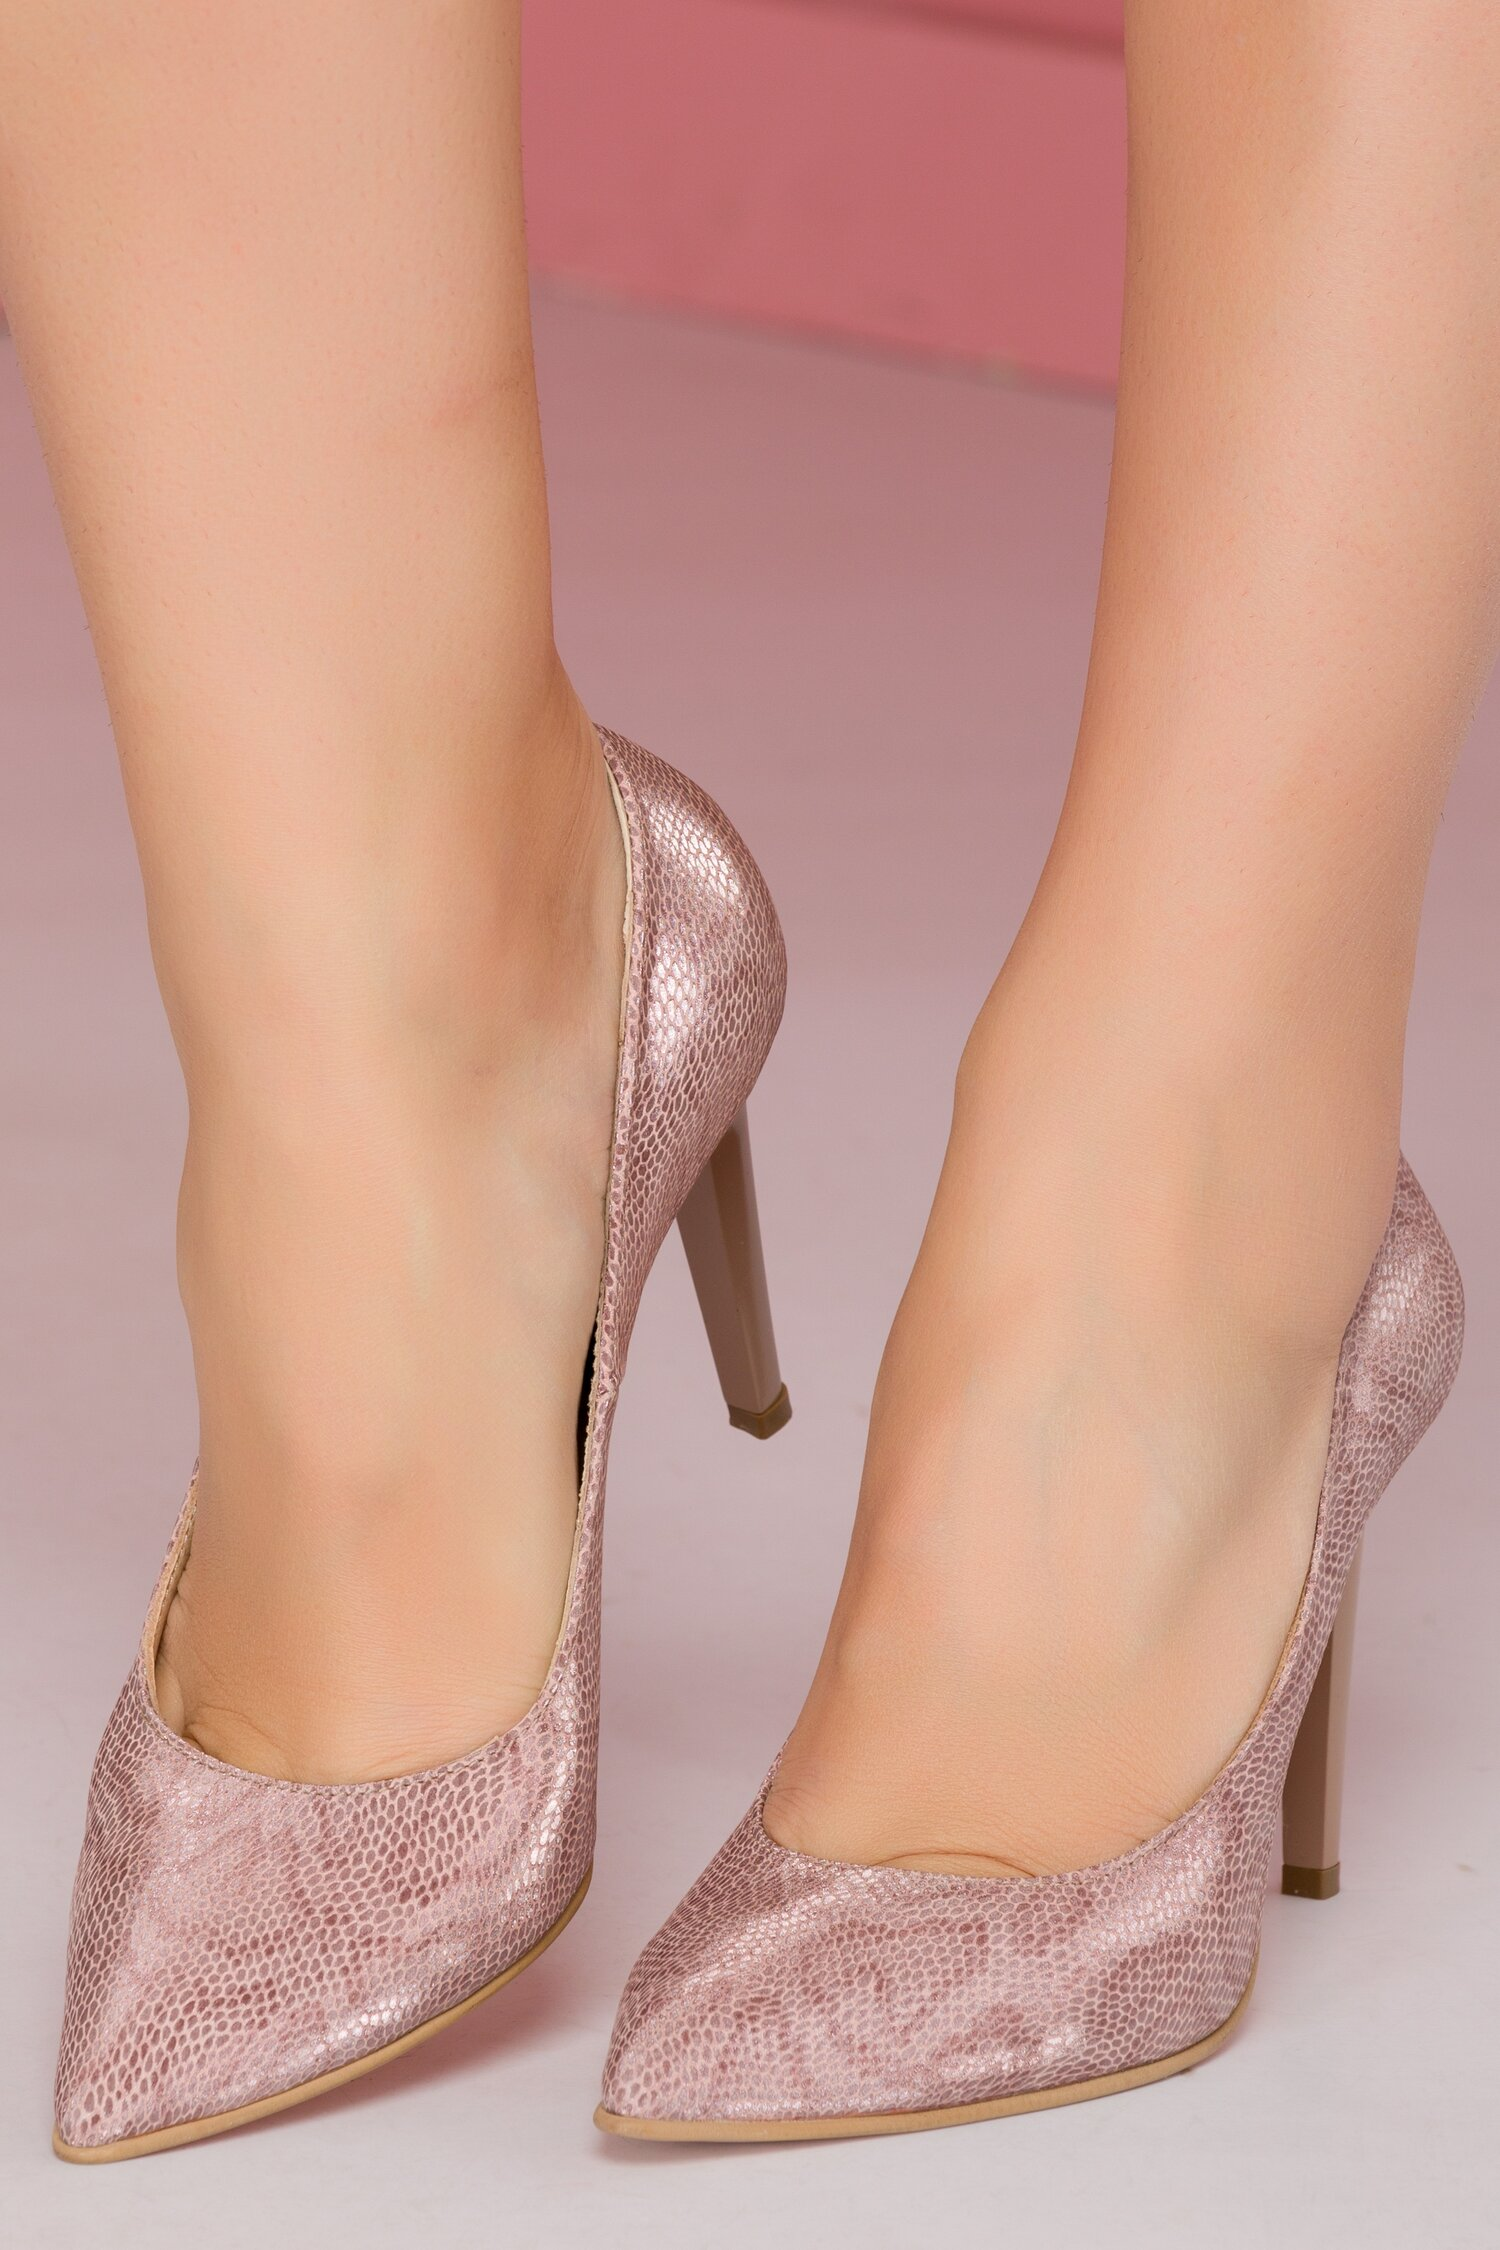 Pantofi Shanon stiletto roz pudrat cu reflexii stralucitoare